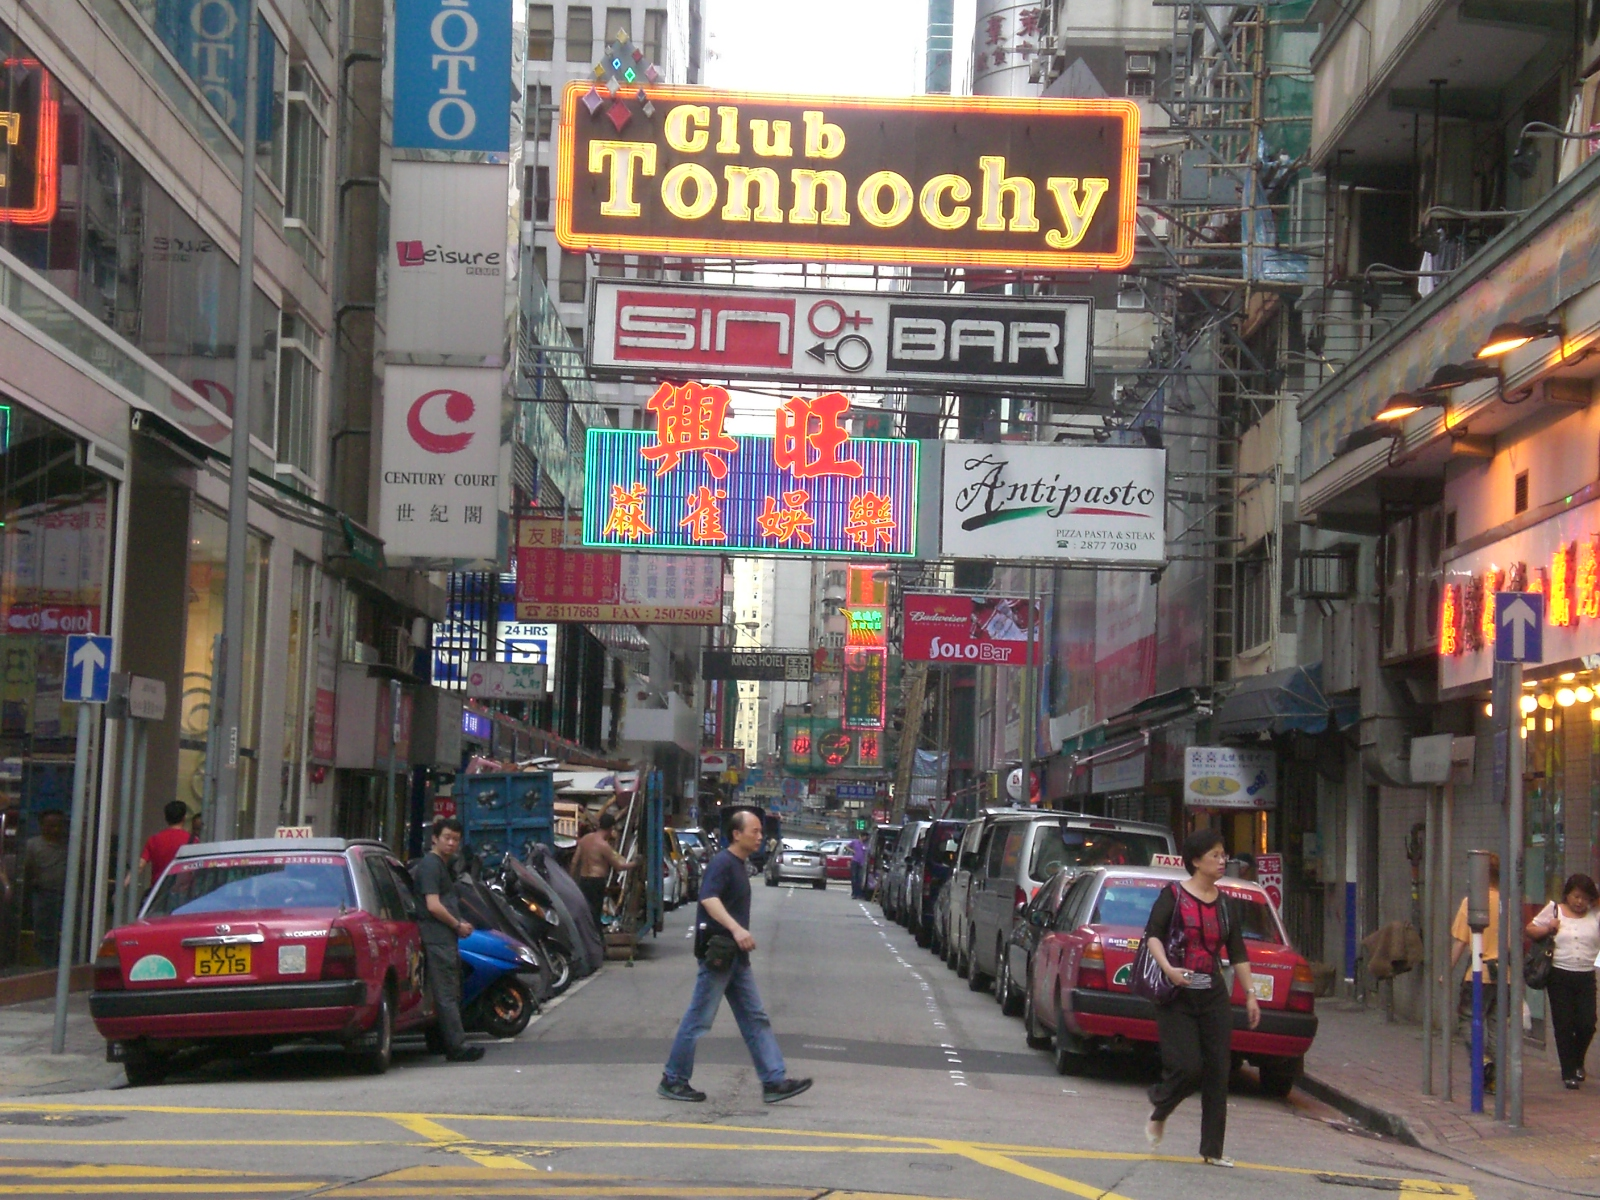 Hong Kong Restaureants Near Southern And Dobson